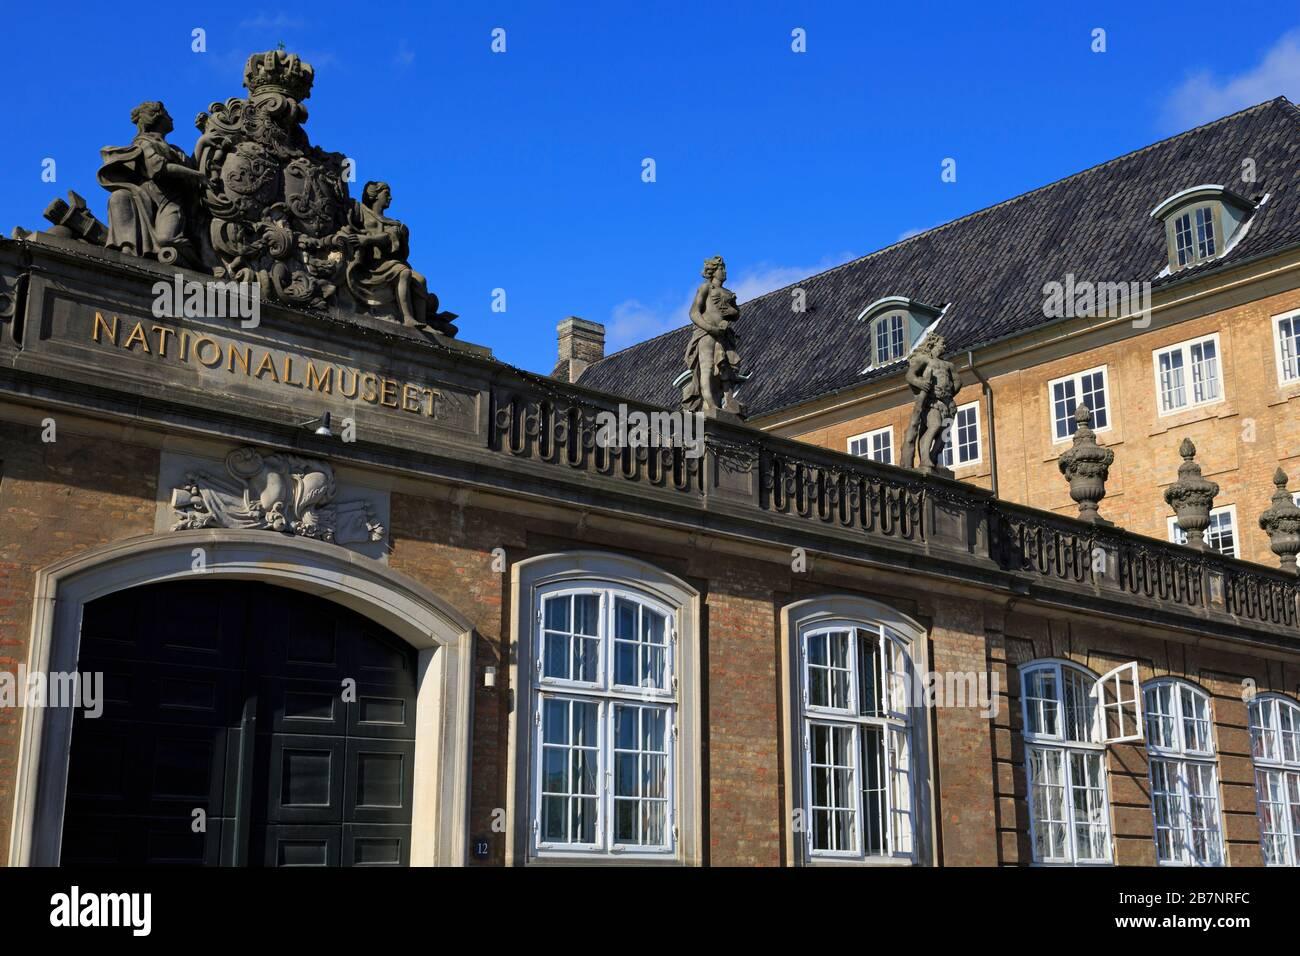 Museo Nacional de Dinamarca, Copenhague, Zelanda, Dinamarca, Europa Foto de stock